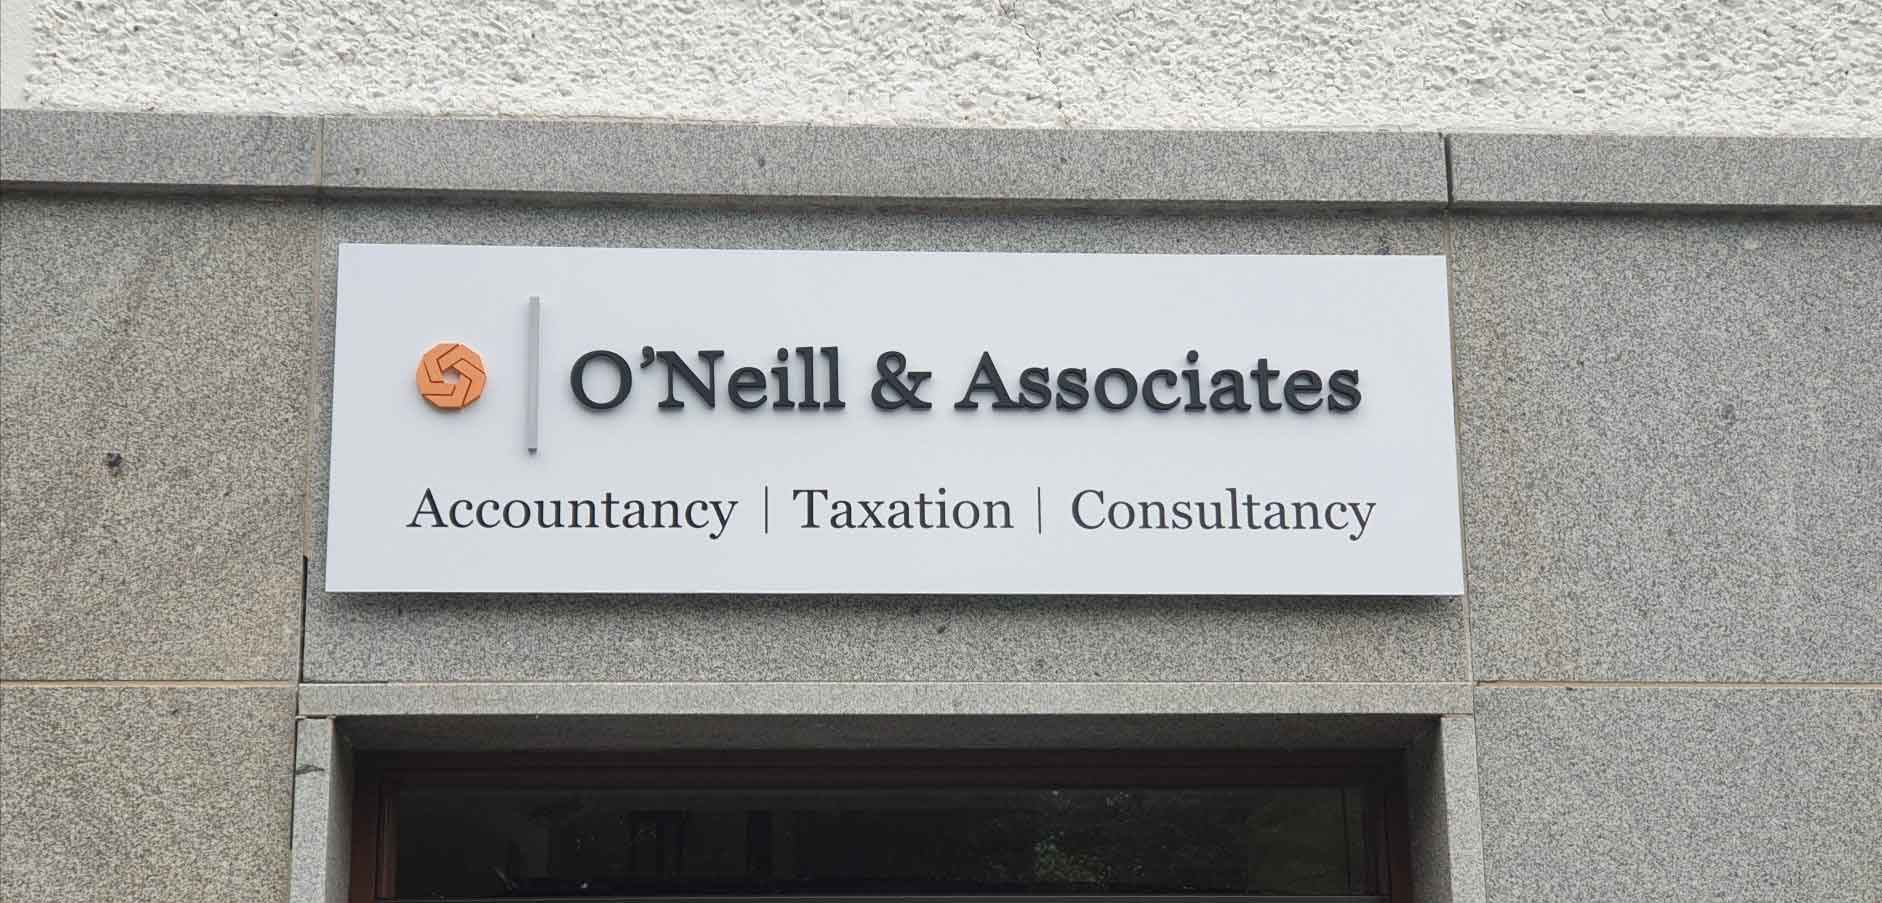 Sean O'Neill and Associates outdoor business sign